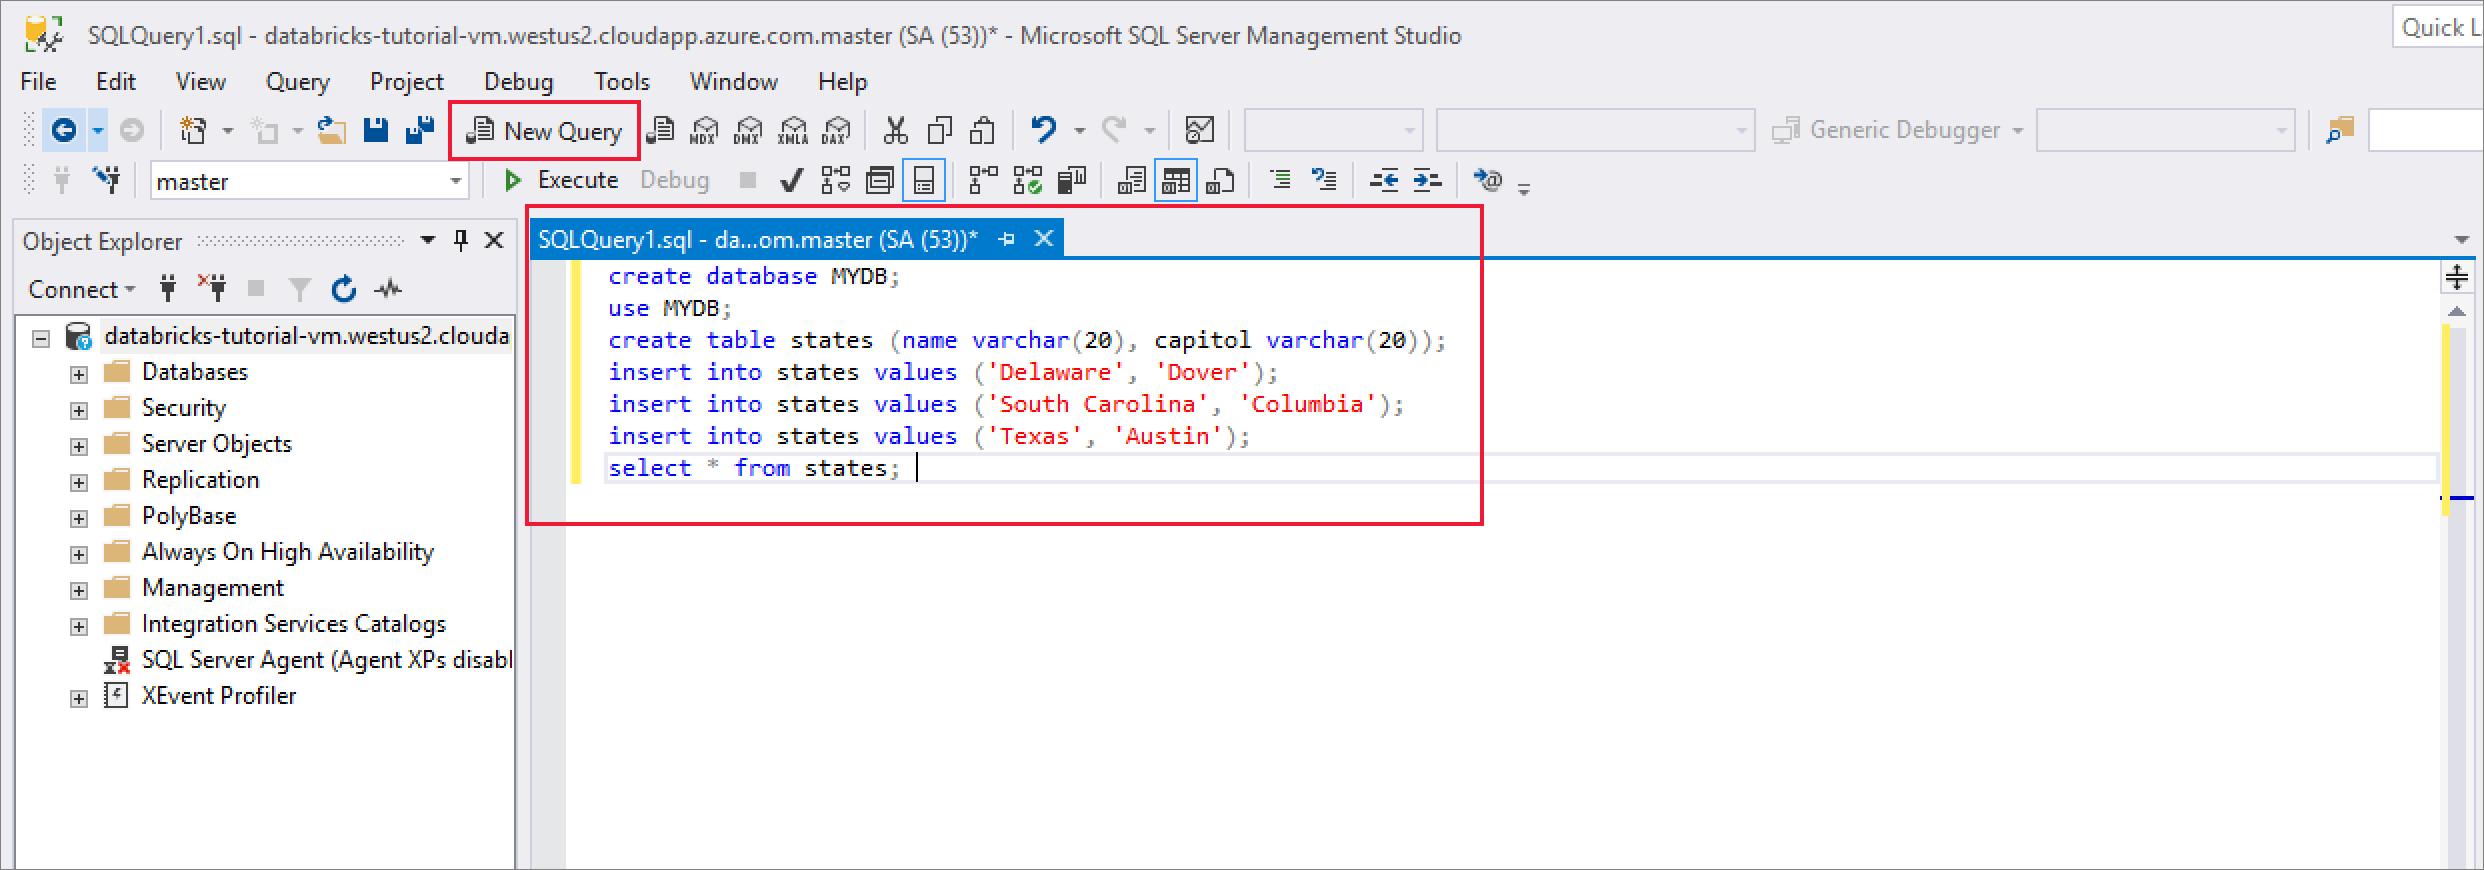 Insert Pandas Dataframe Into Sql Server